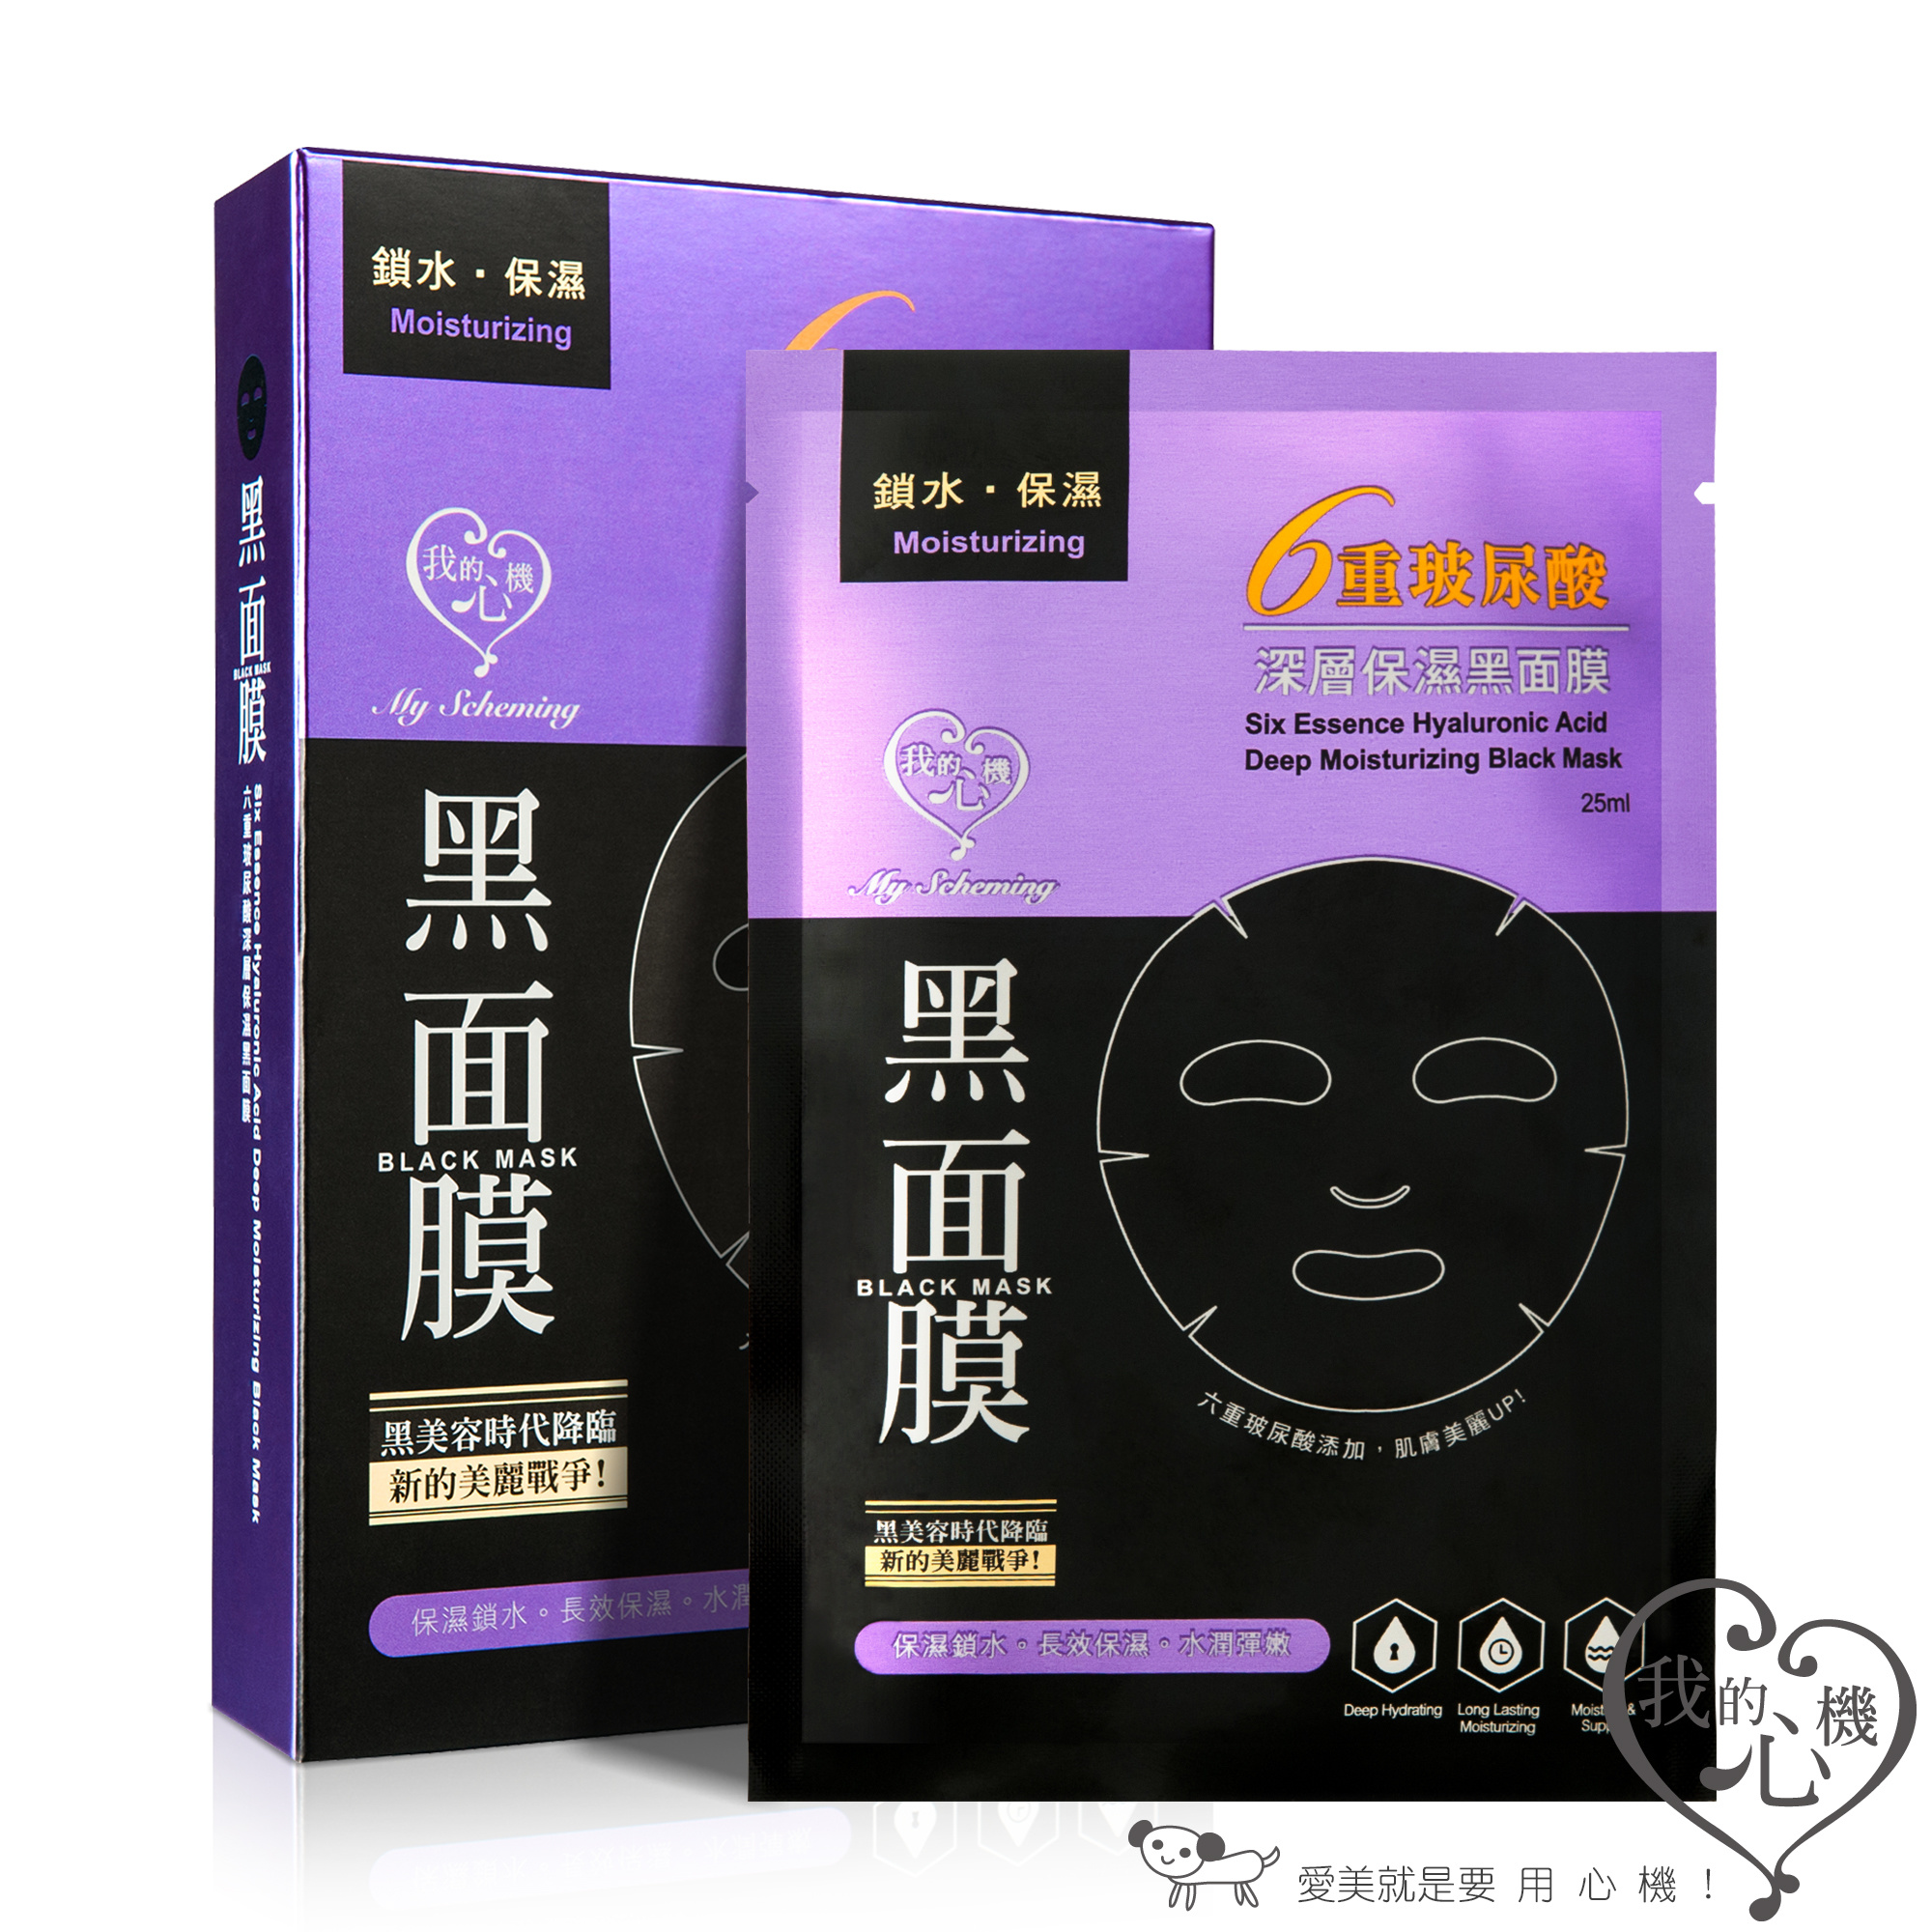 Six Essence Hyaluronic Acid Deep Moisturizing Black Mask (5 pcs)-1